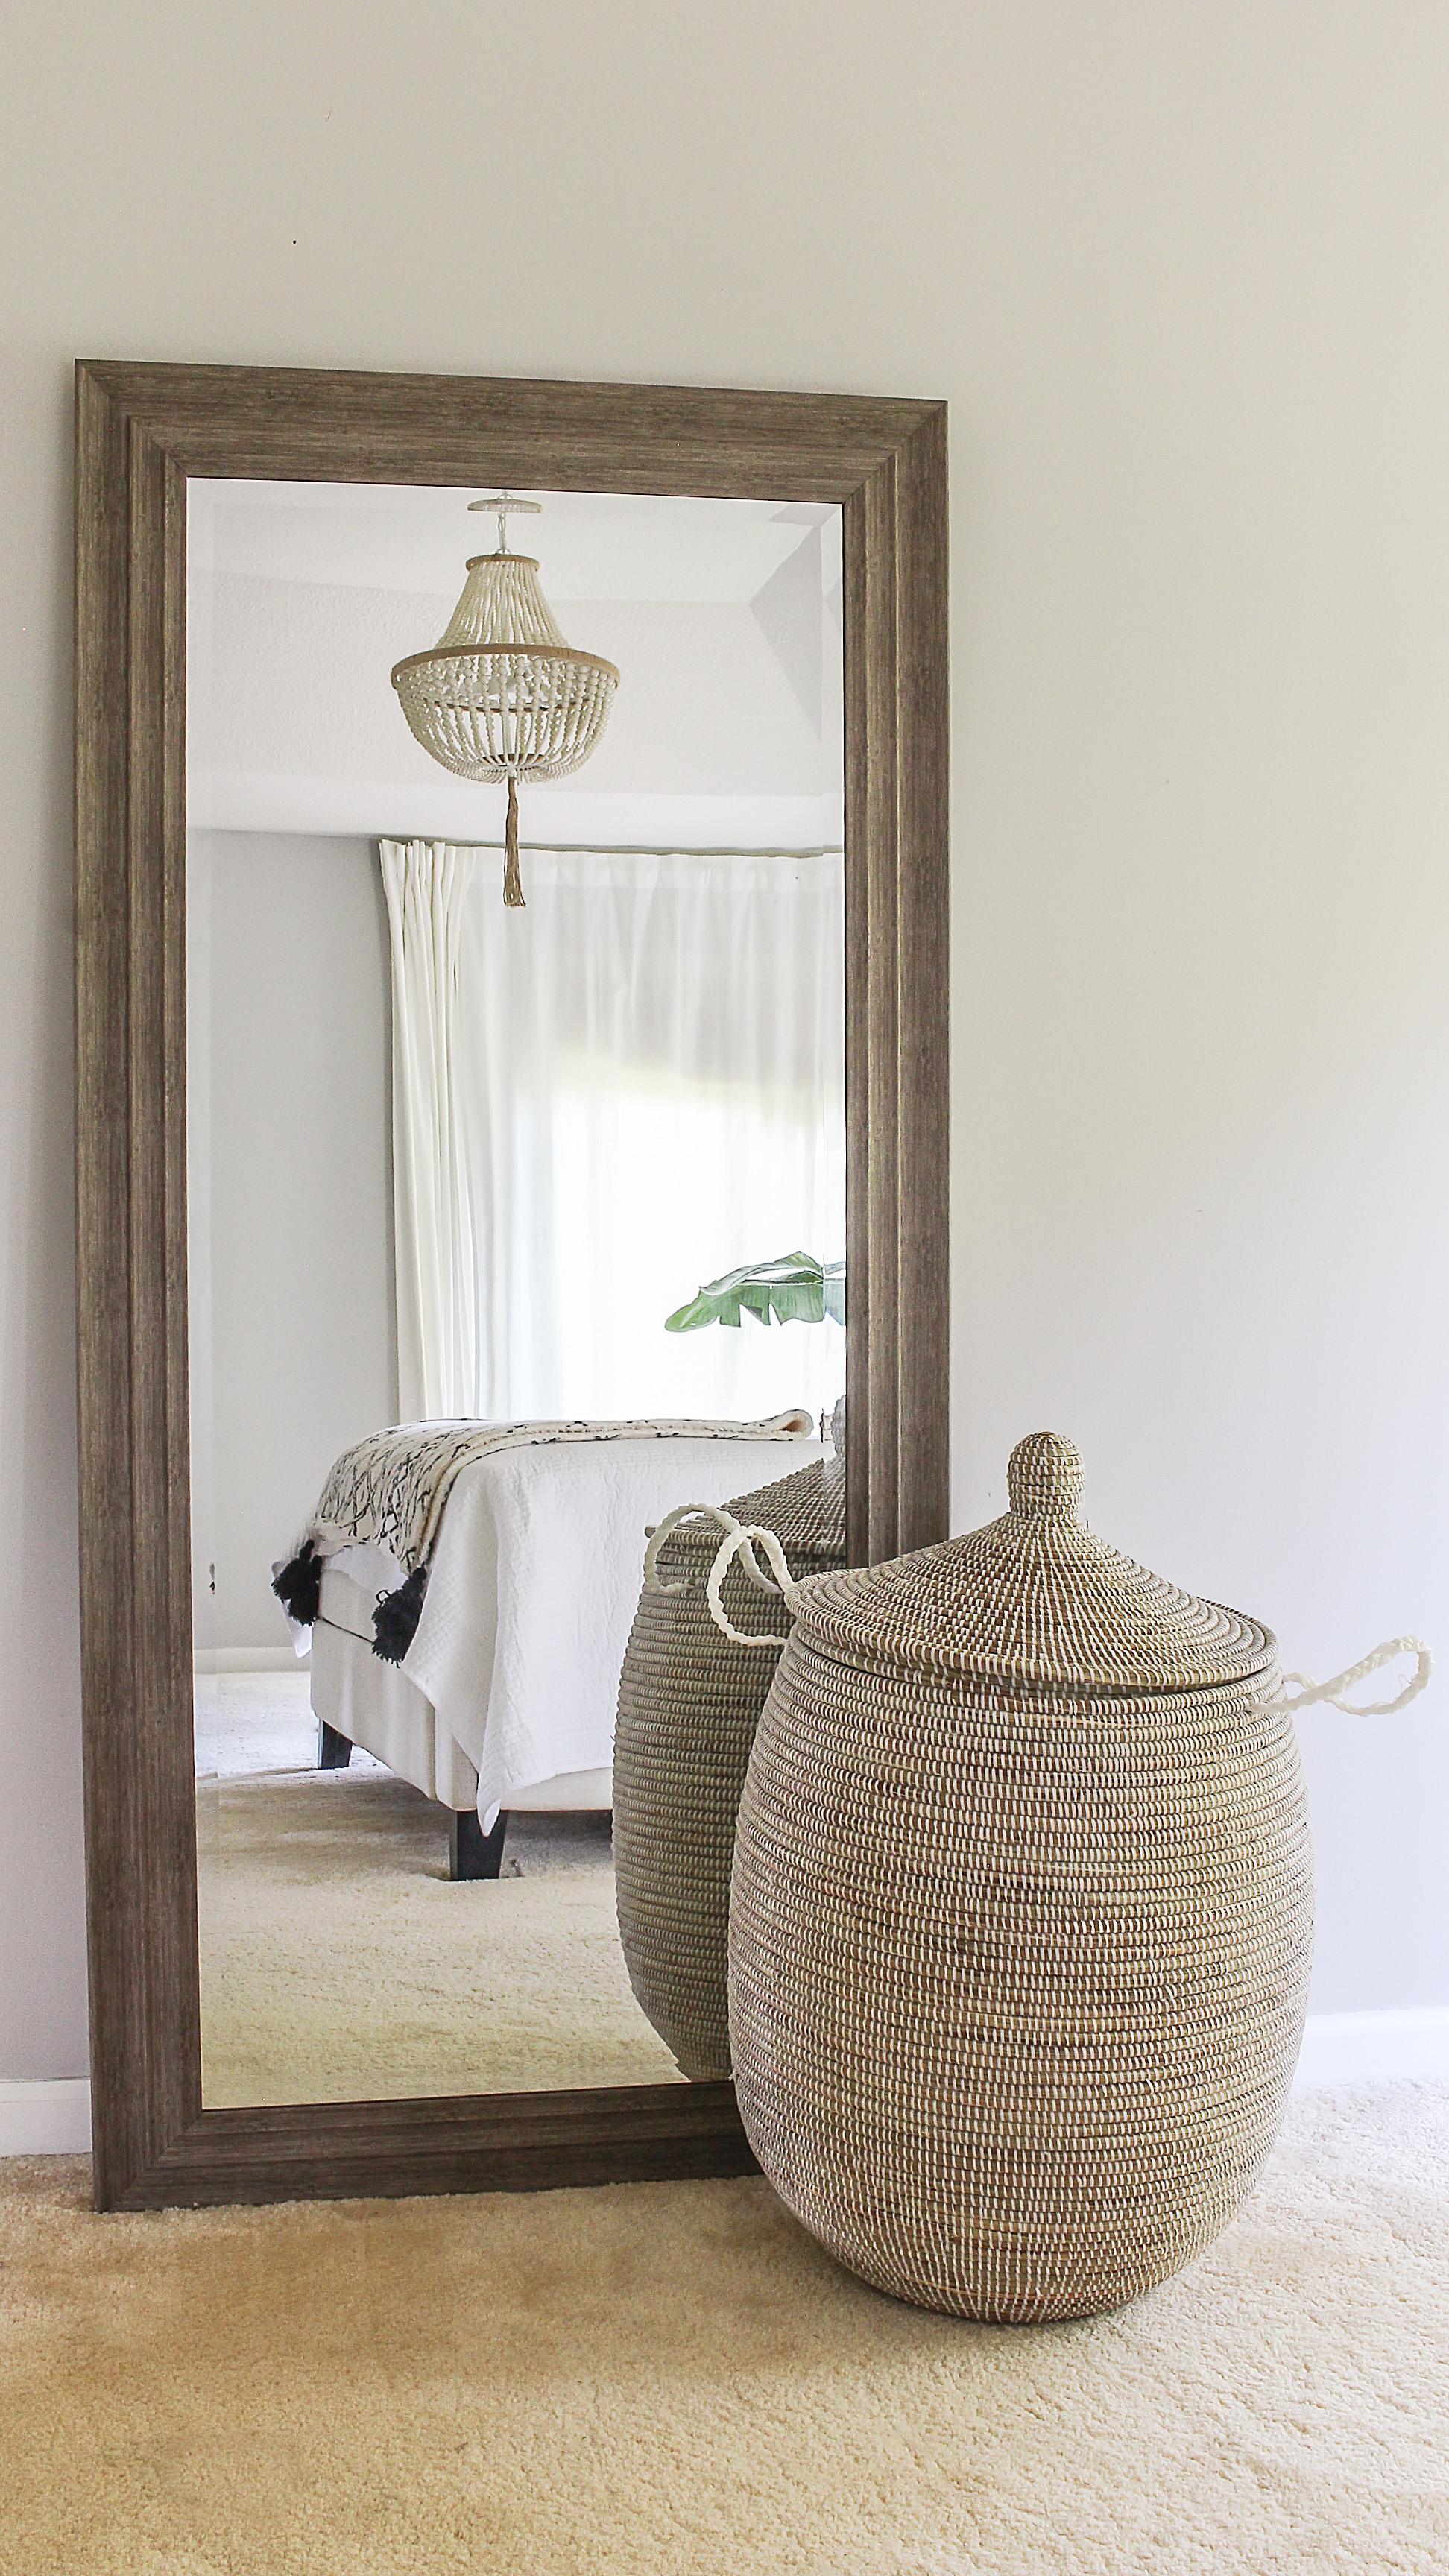 Farmhouse Bedroom Ideas On A Budget Design Corral